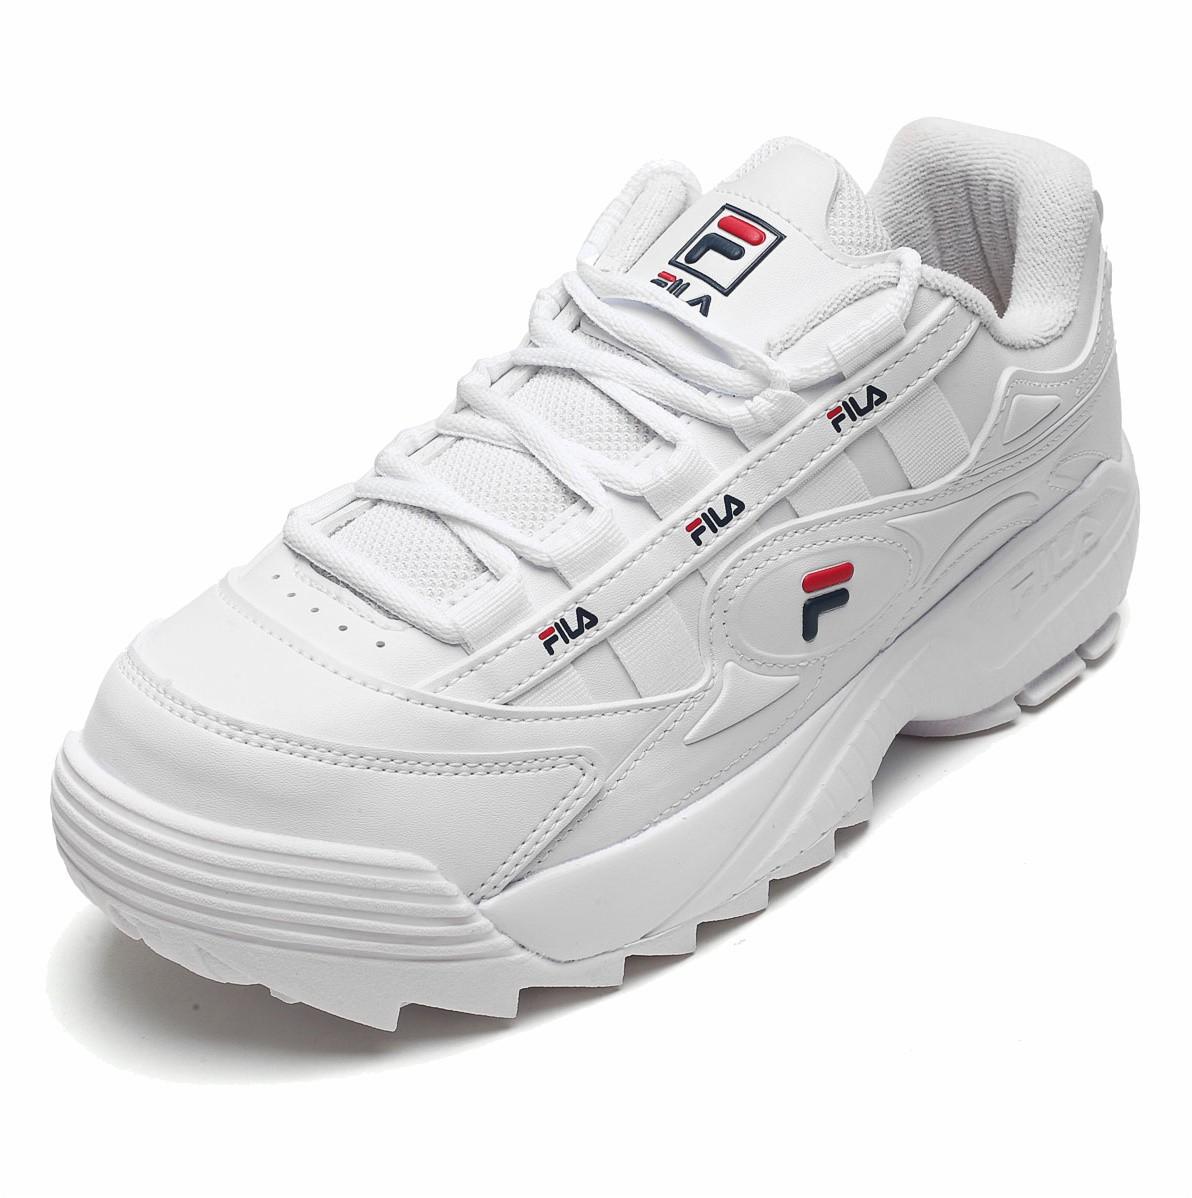 Tenis Fila D Formation Feminino Chunky Sneaker Livestyle